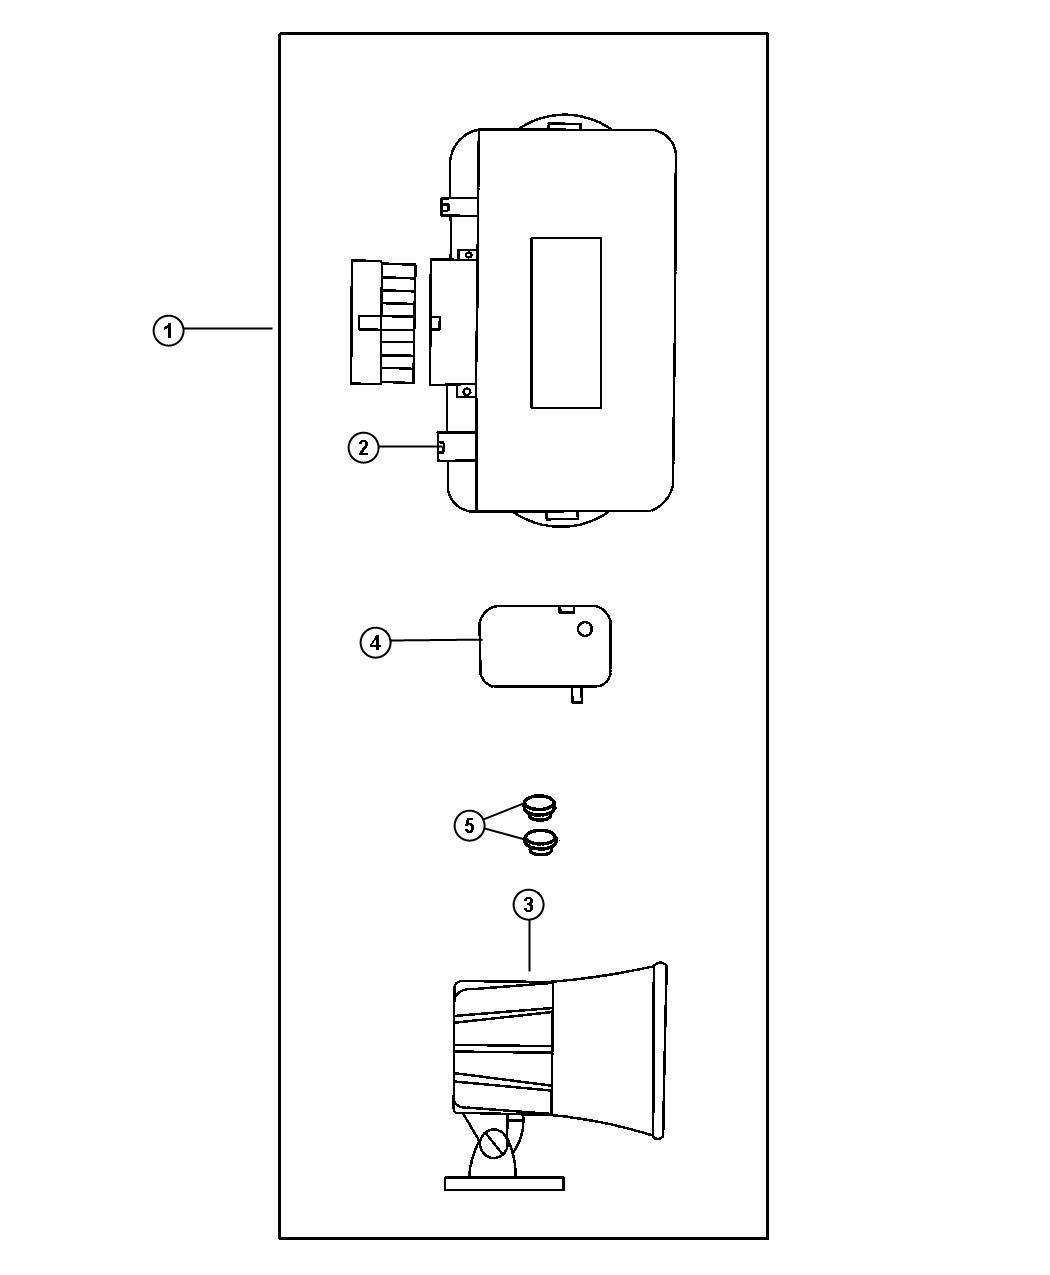 Jeep Wrangler Wiring Kit  Alarm Without Keyless  Evs